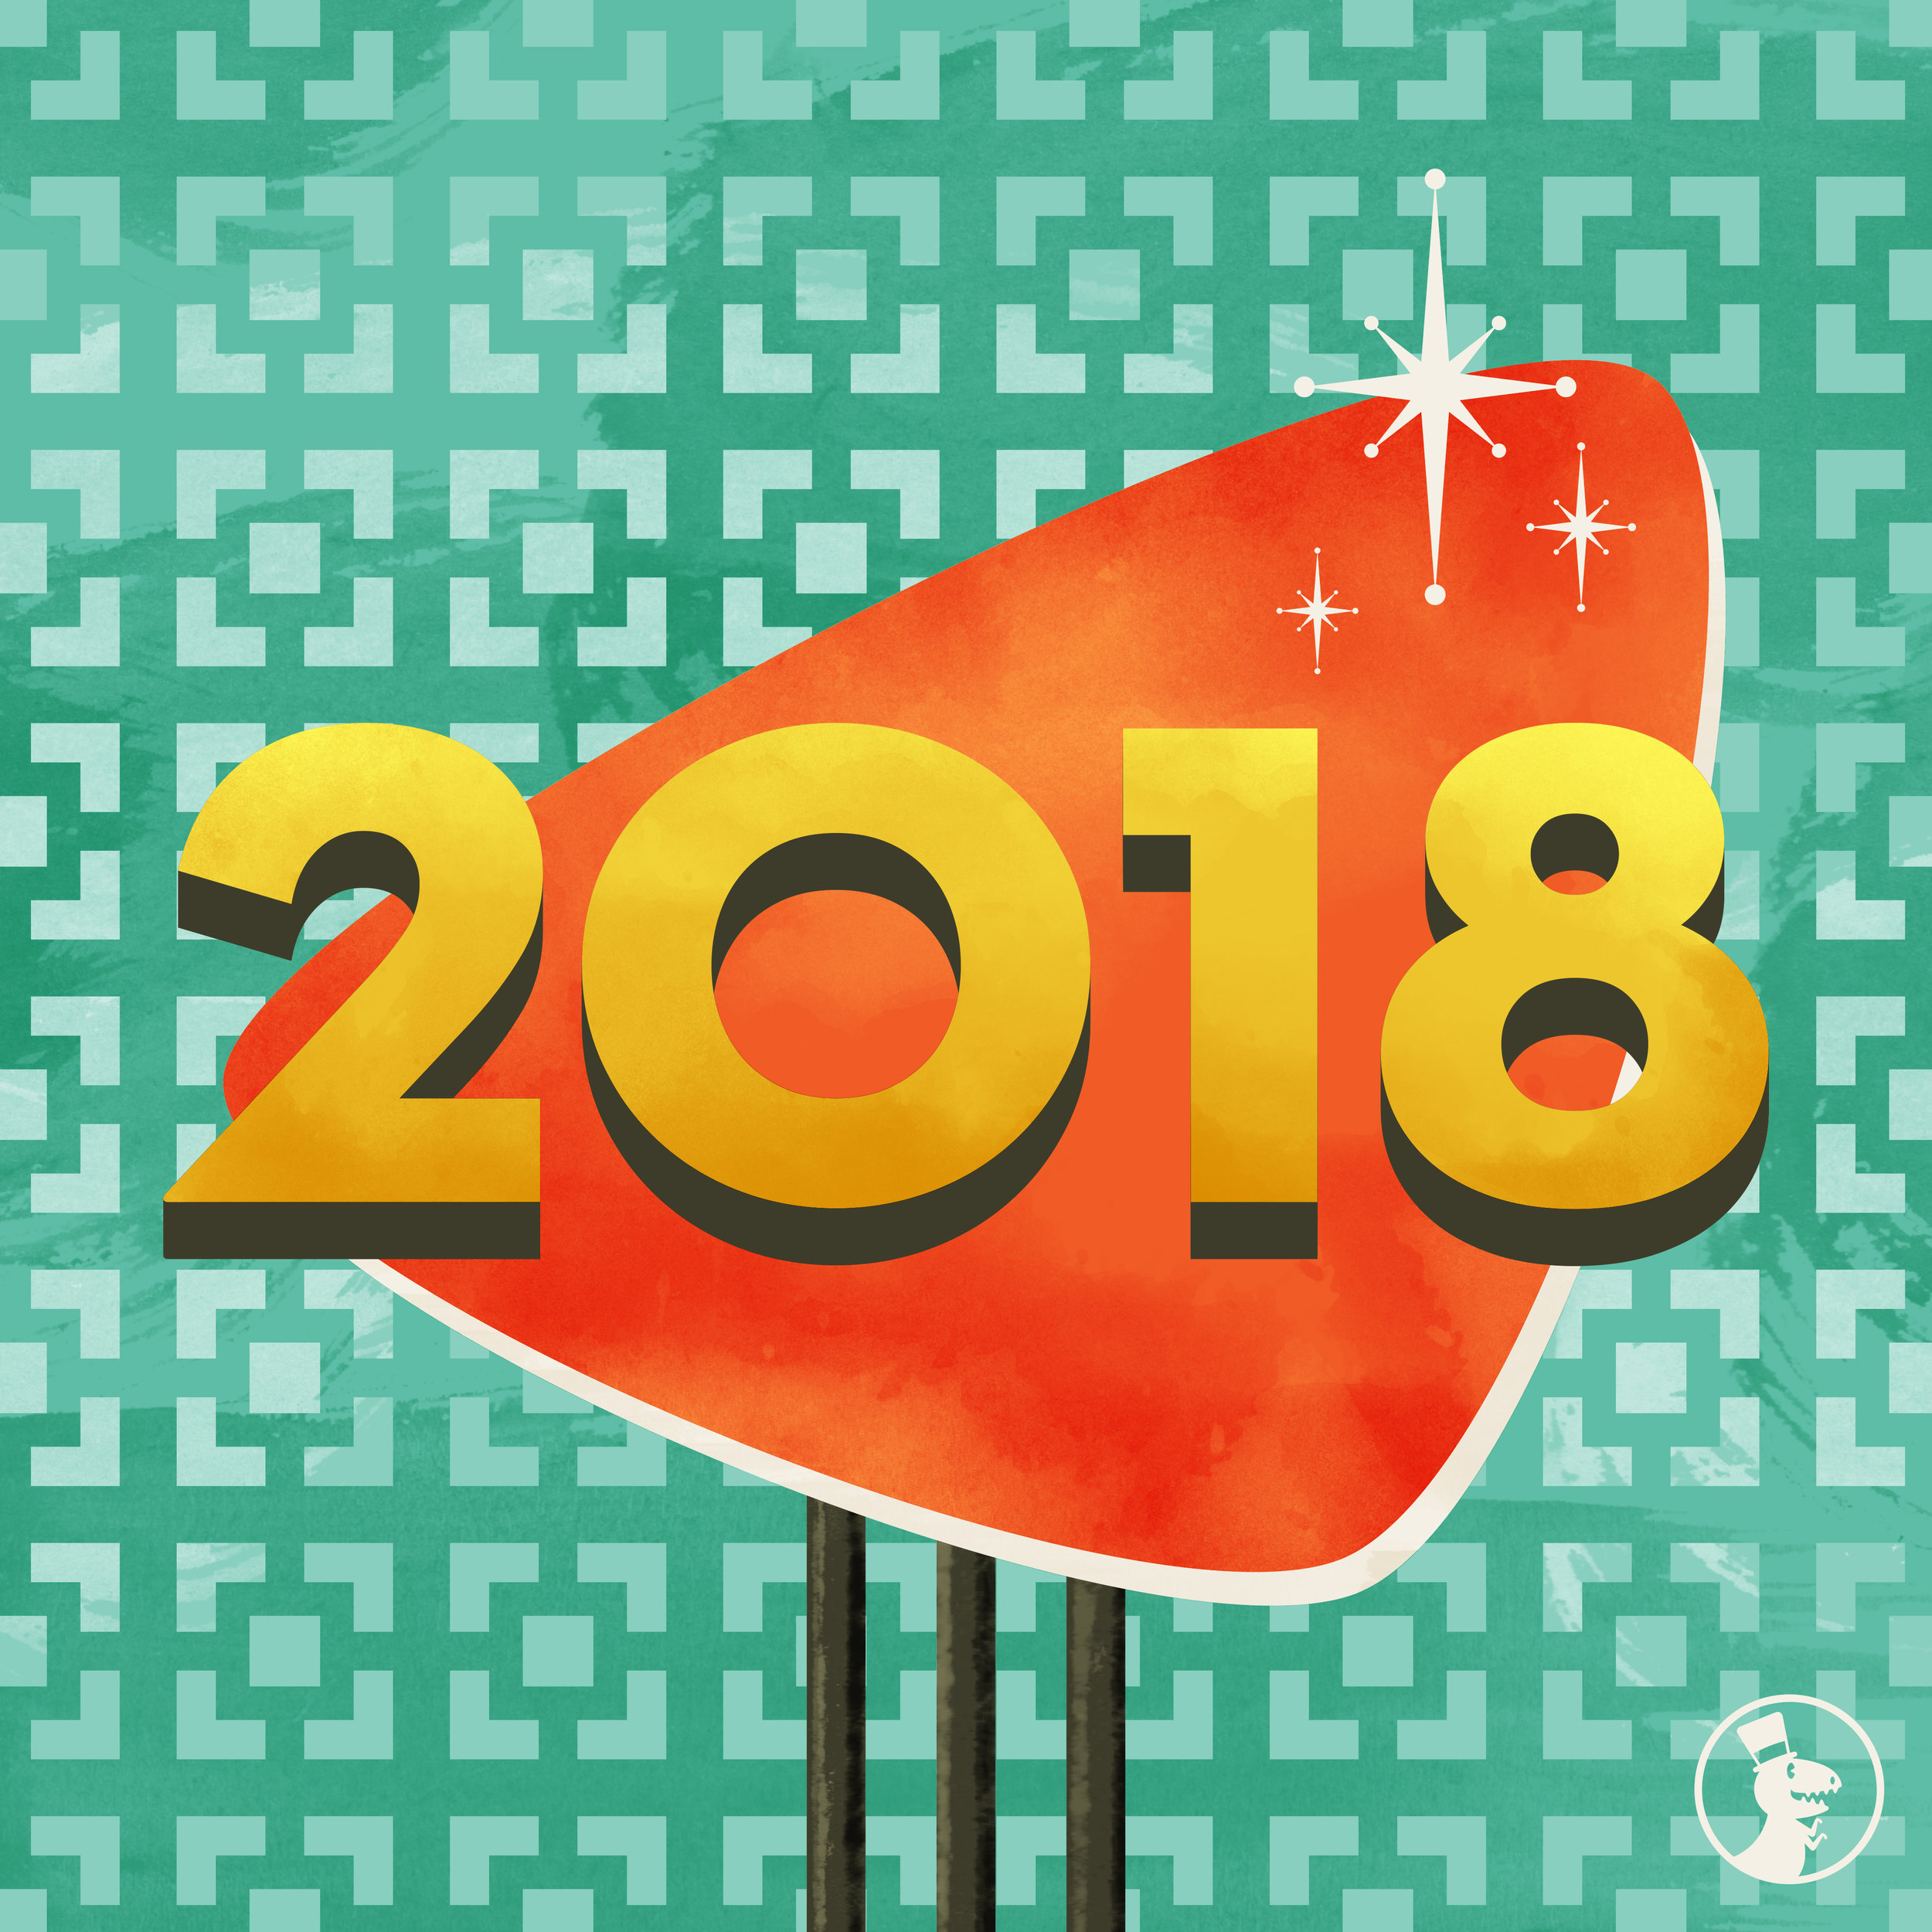 2018 New Year.jpg